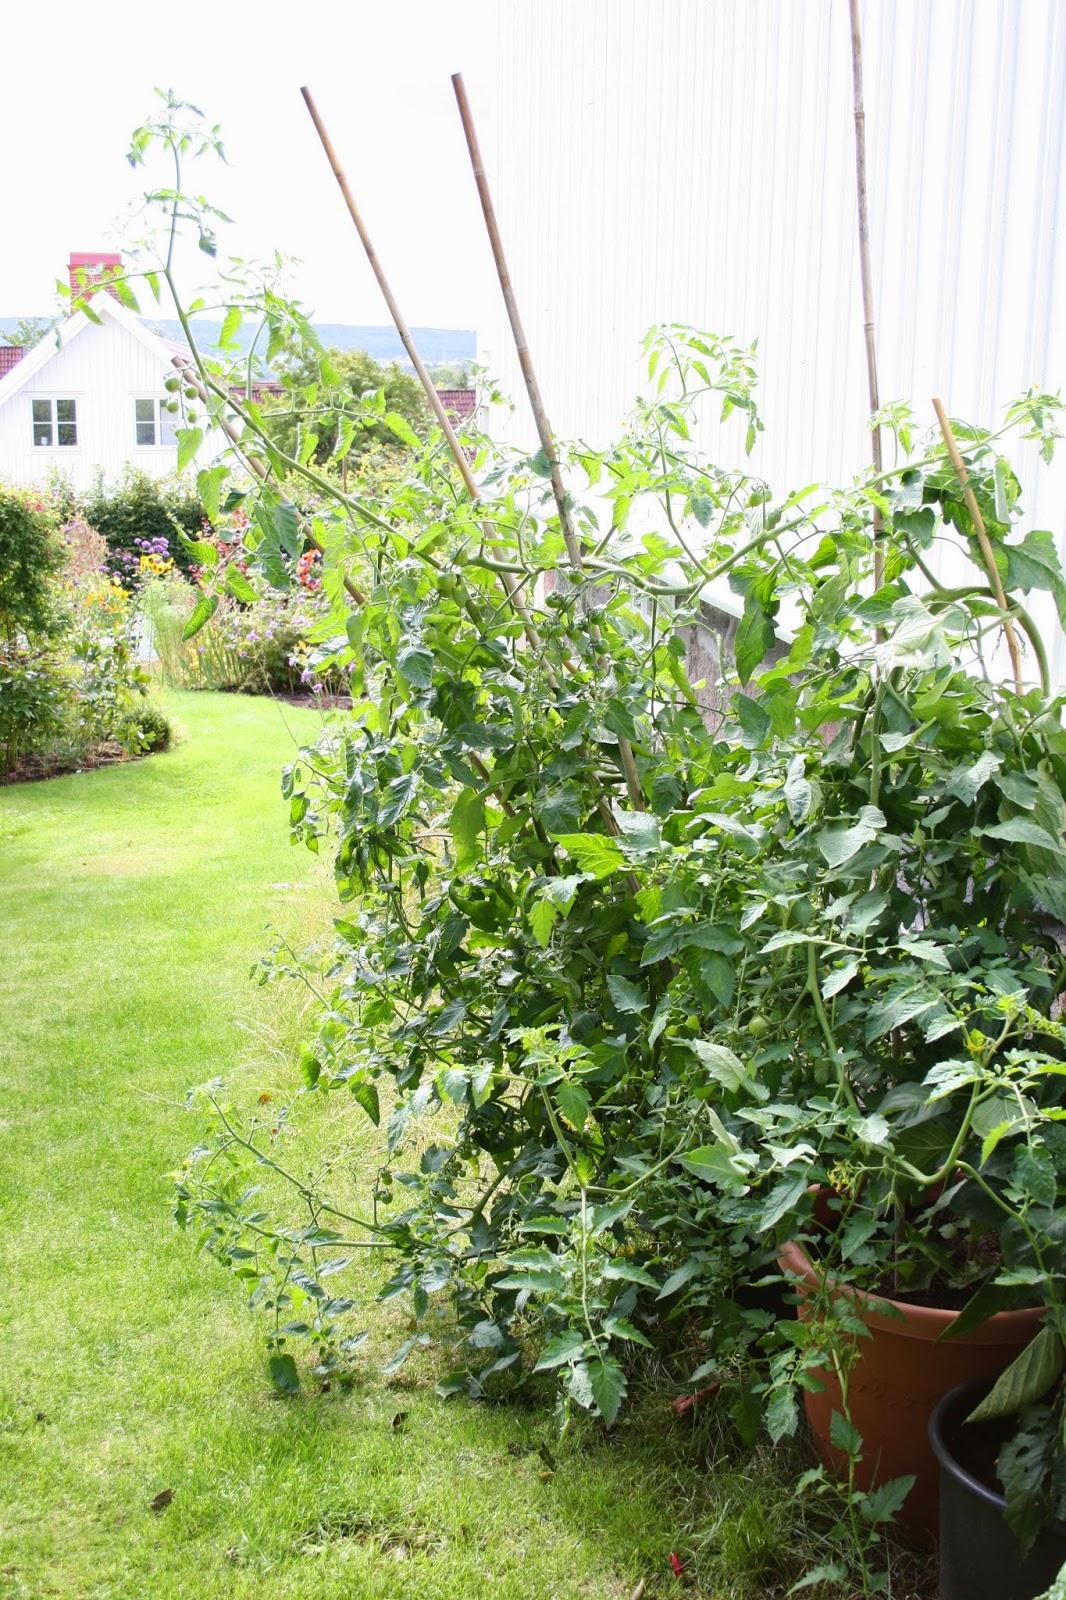 odla tomater i kruka